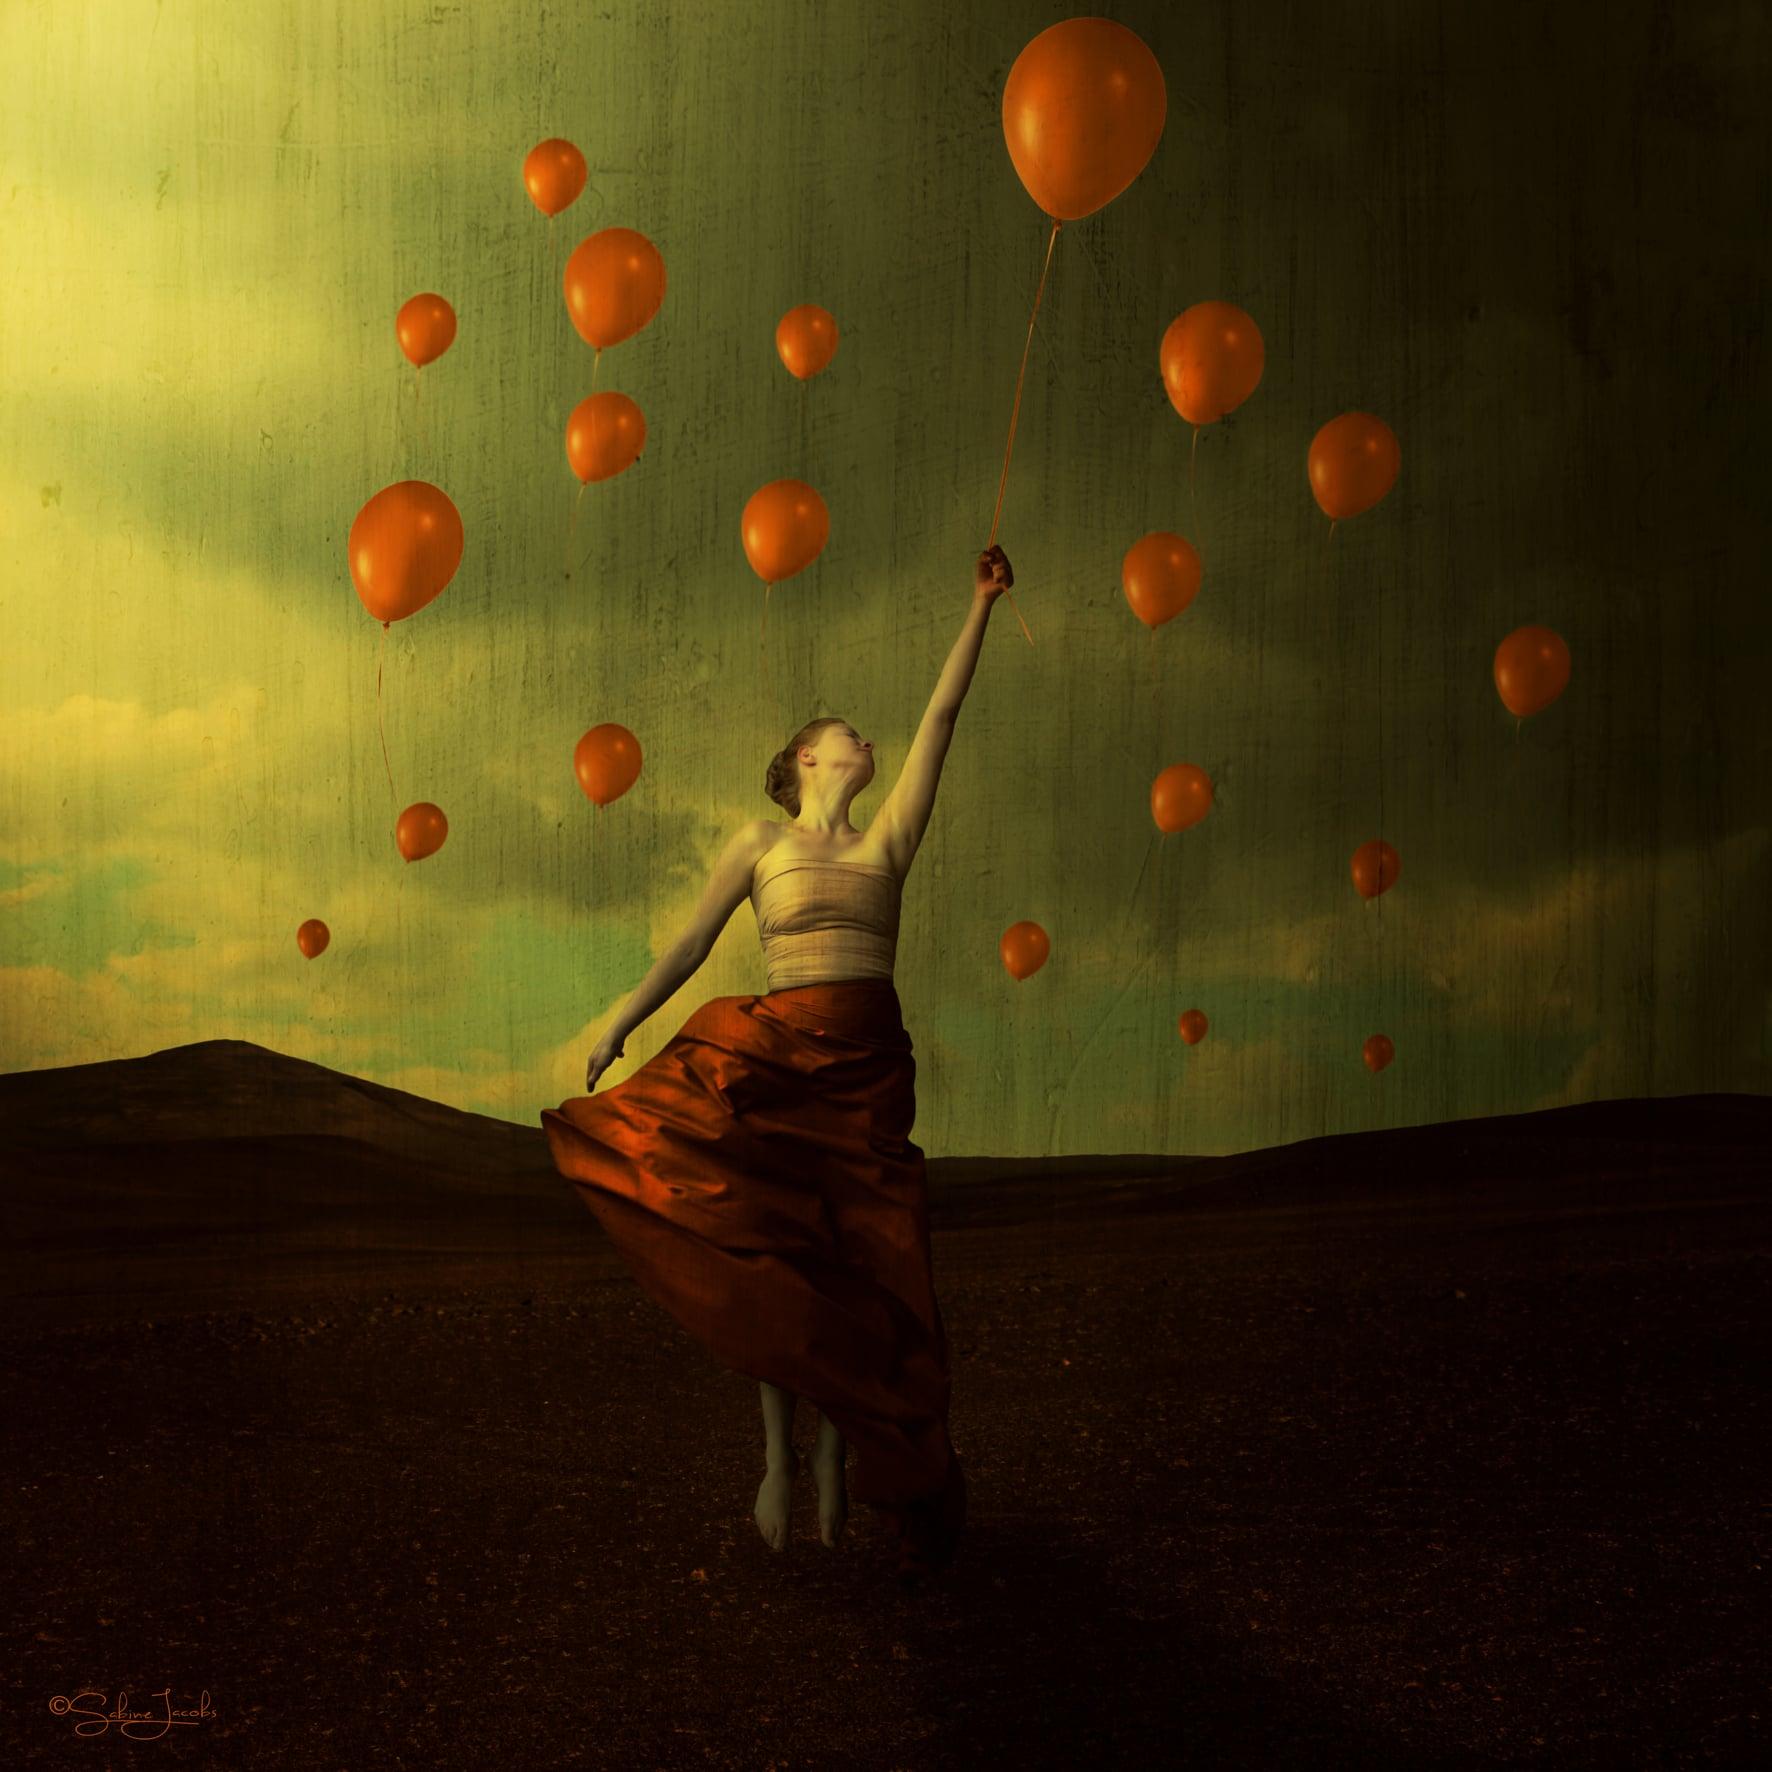 one_balloon_1.jpg